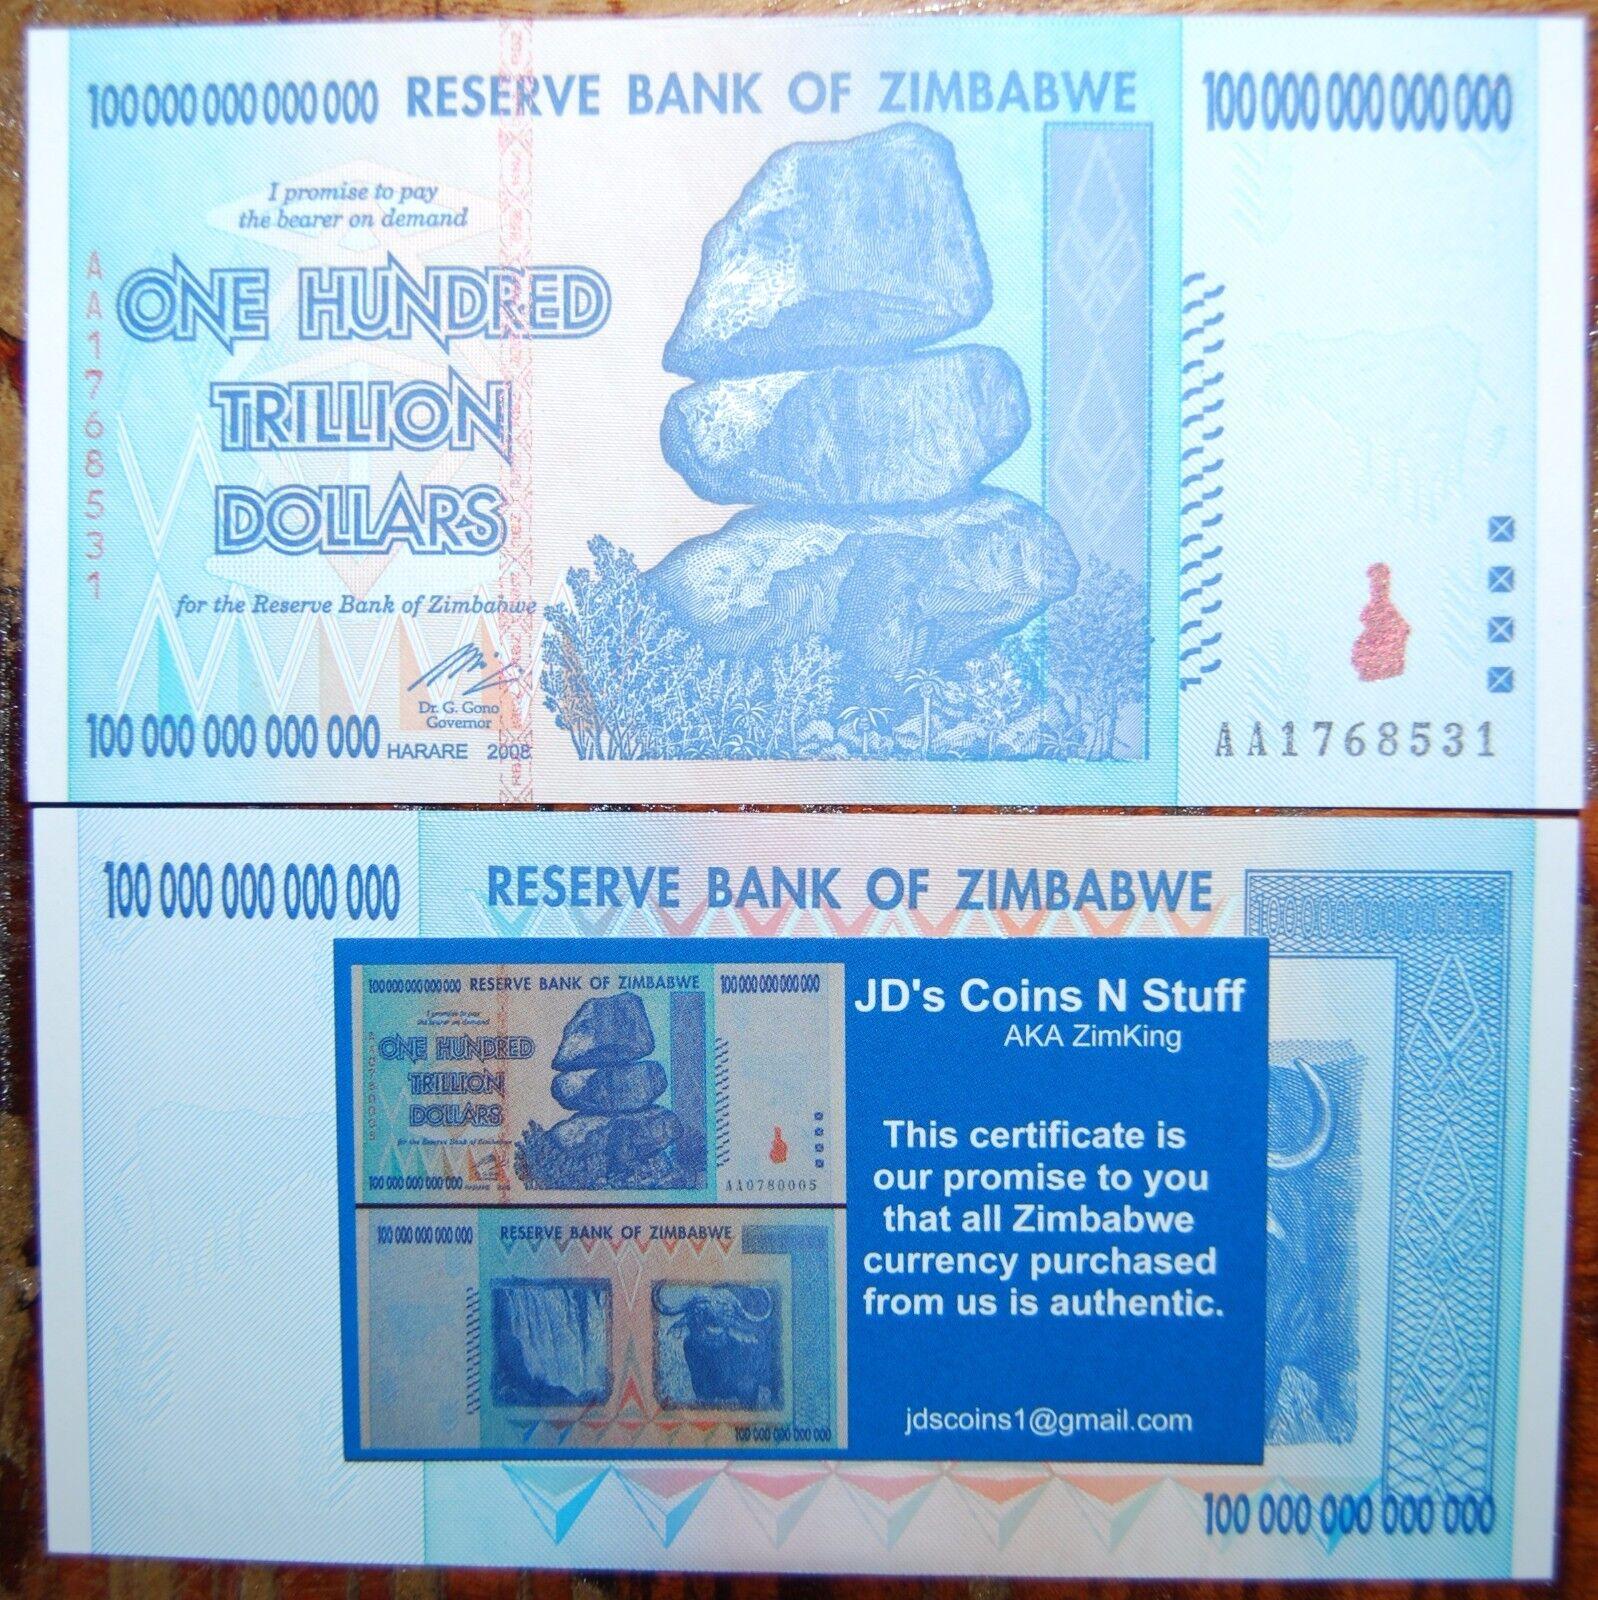 ZIMBABWE 100 TRILLION DOLLAR! FREE PRIORITY USPS 2-3 DAY SHIPPING!